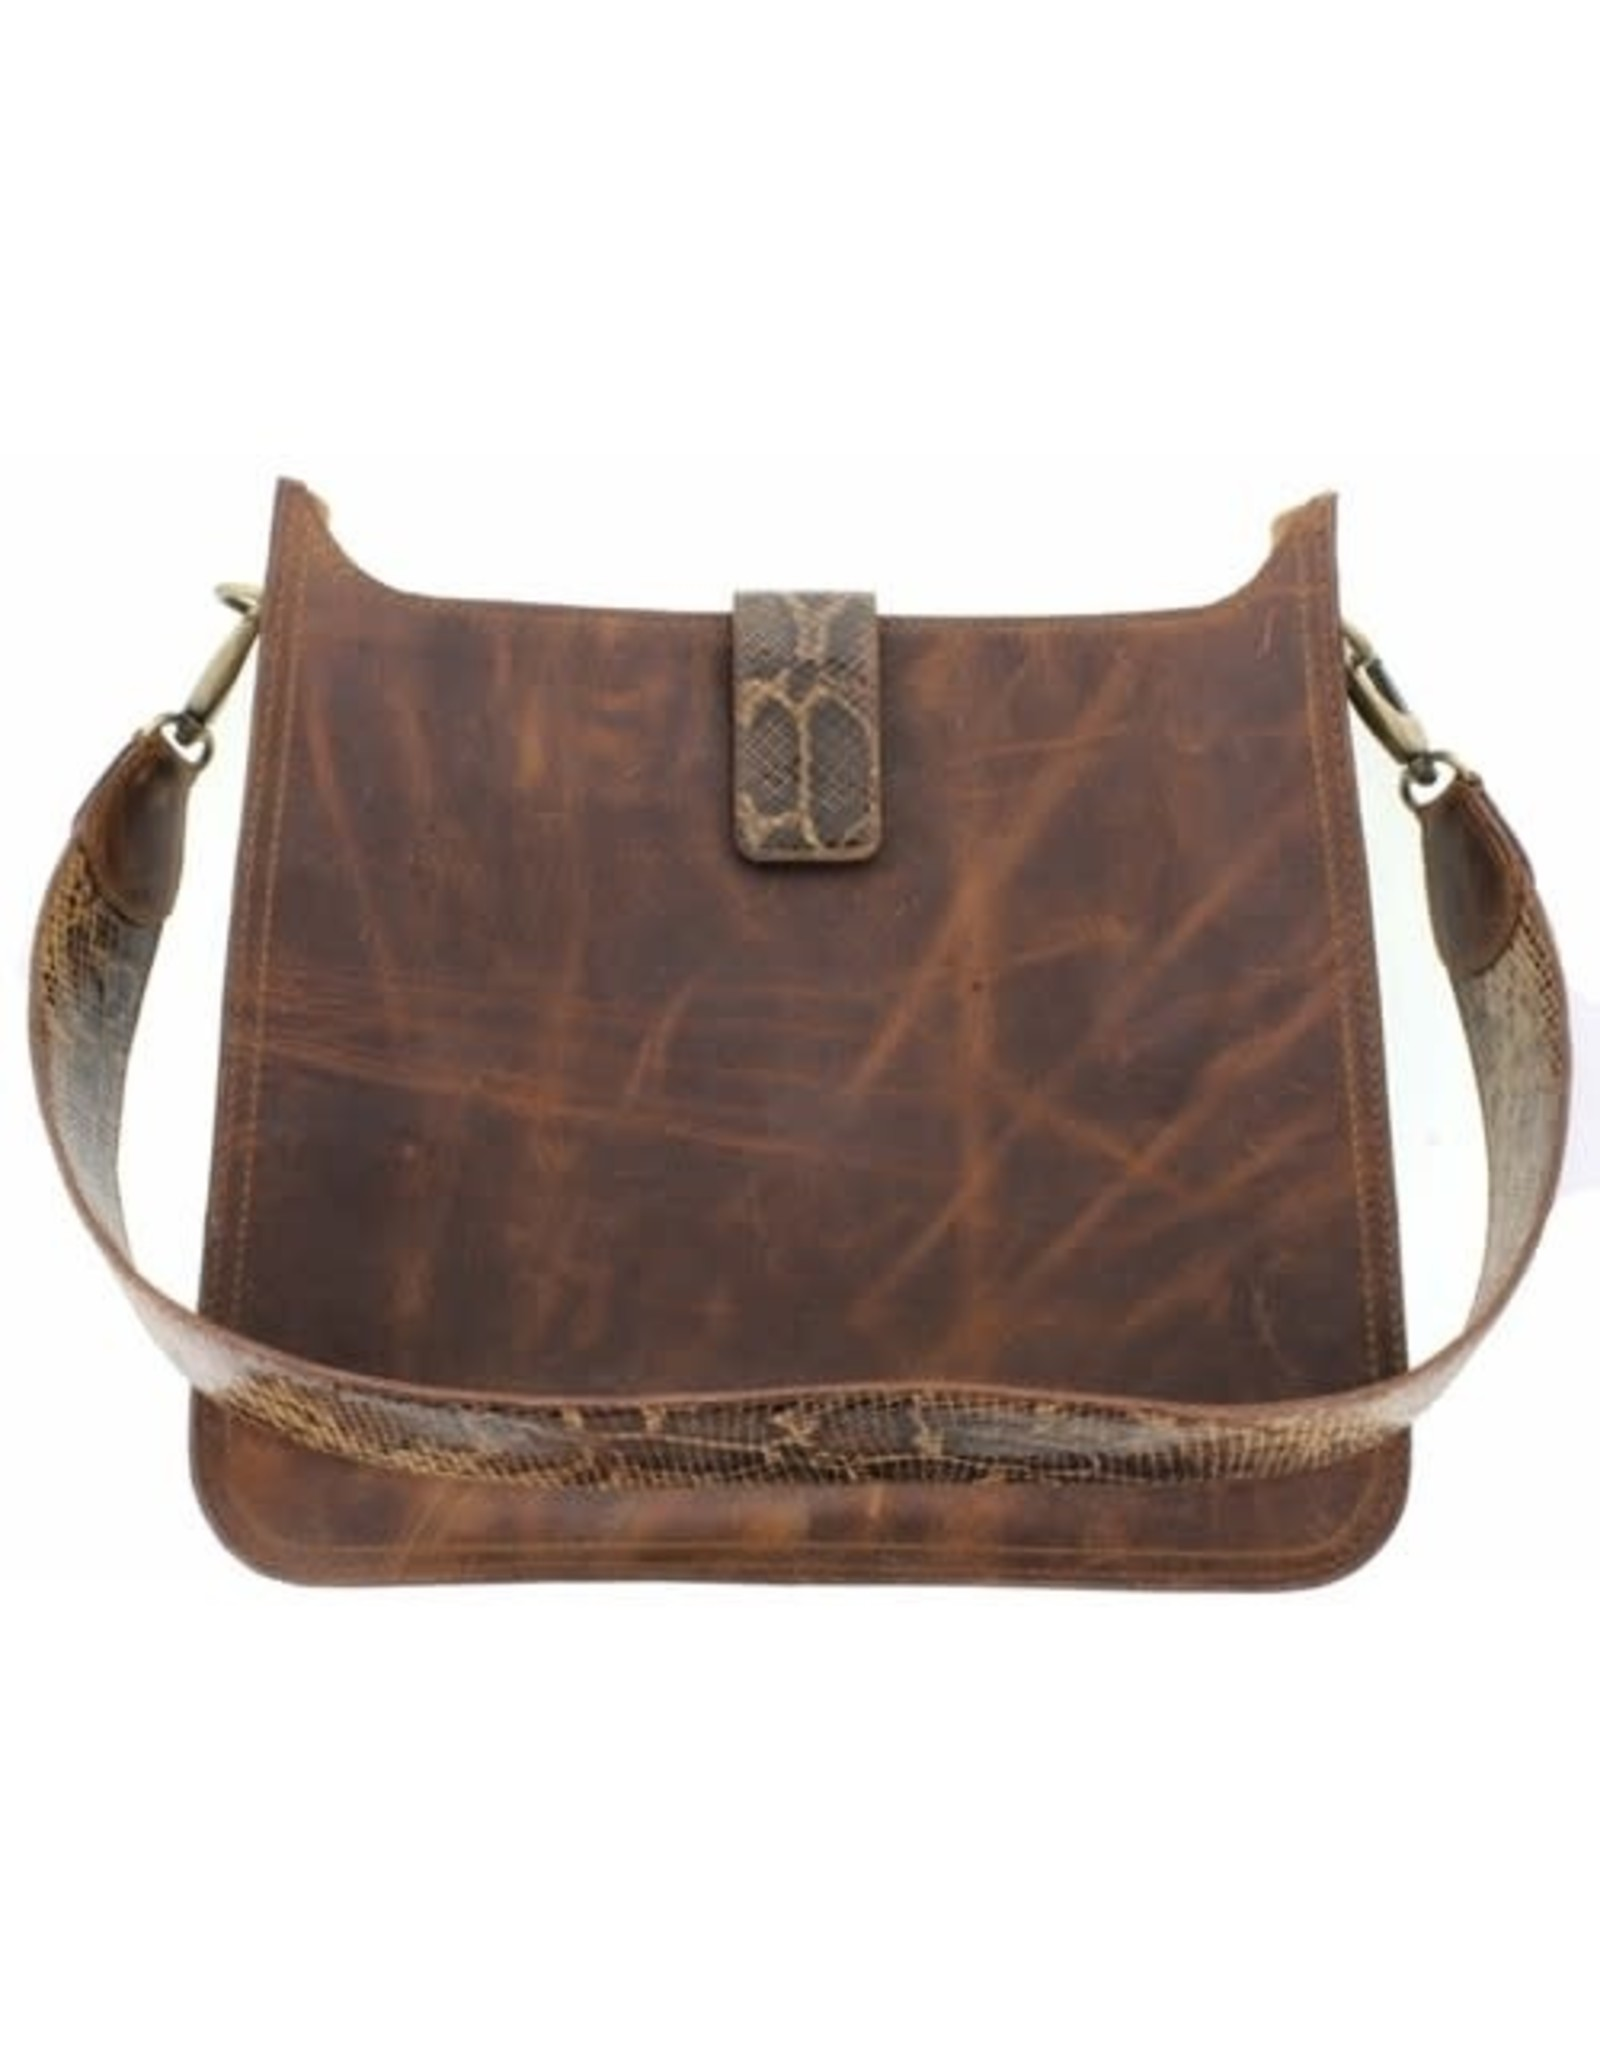 Sadie Snakeskin & Brn Leather Purse